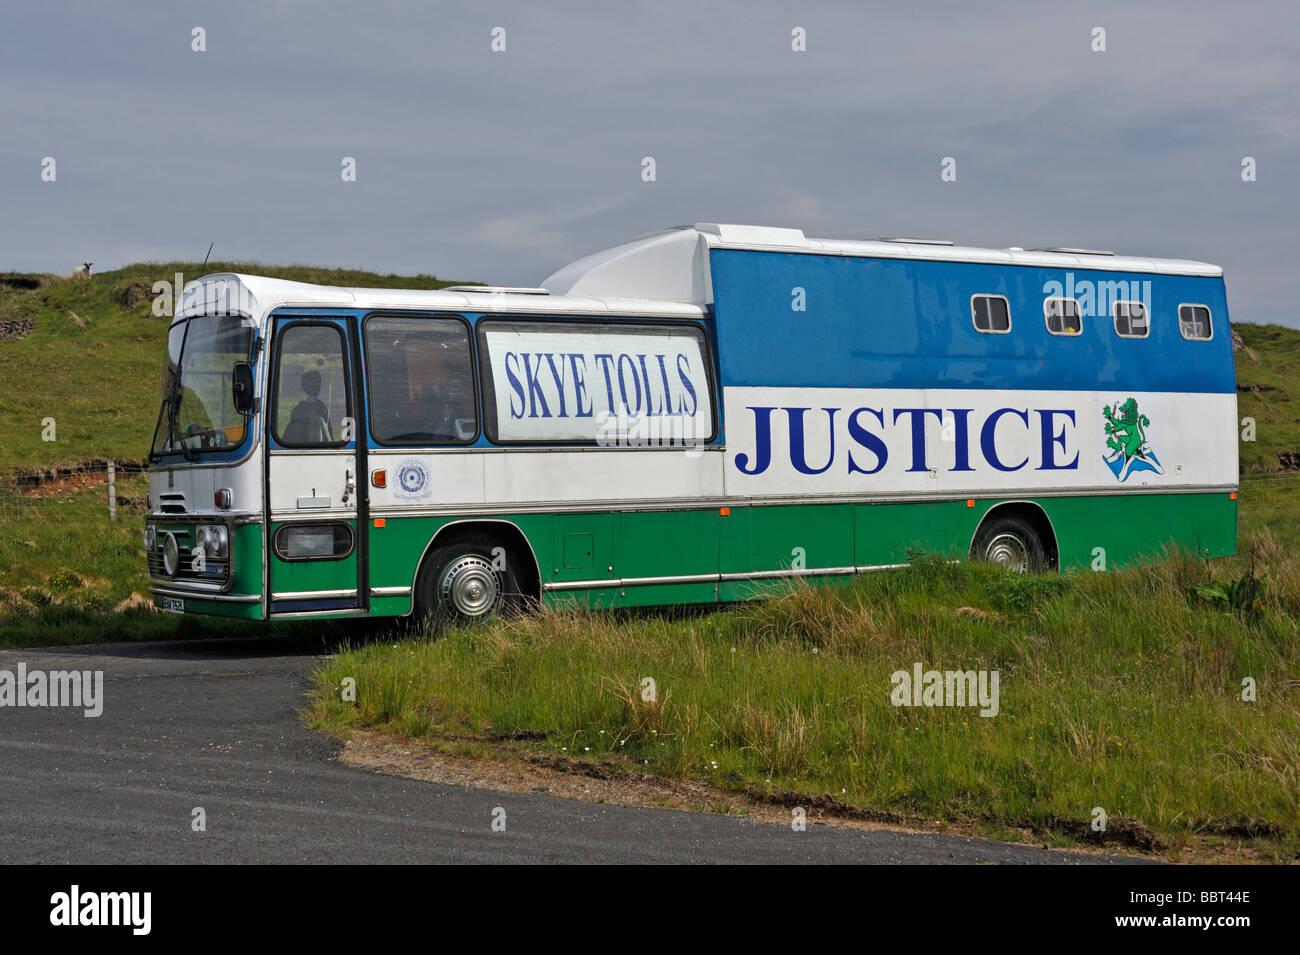 Skye Tolls Justice bus. Bracadale, Isle of Skye, Inner Hebrides, Scotland, United Kingdom, Europe. - Stock Image